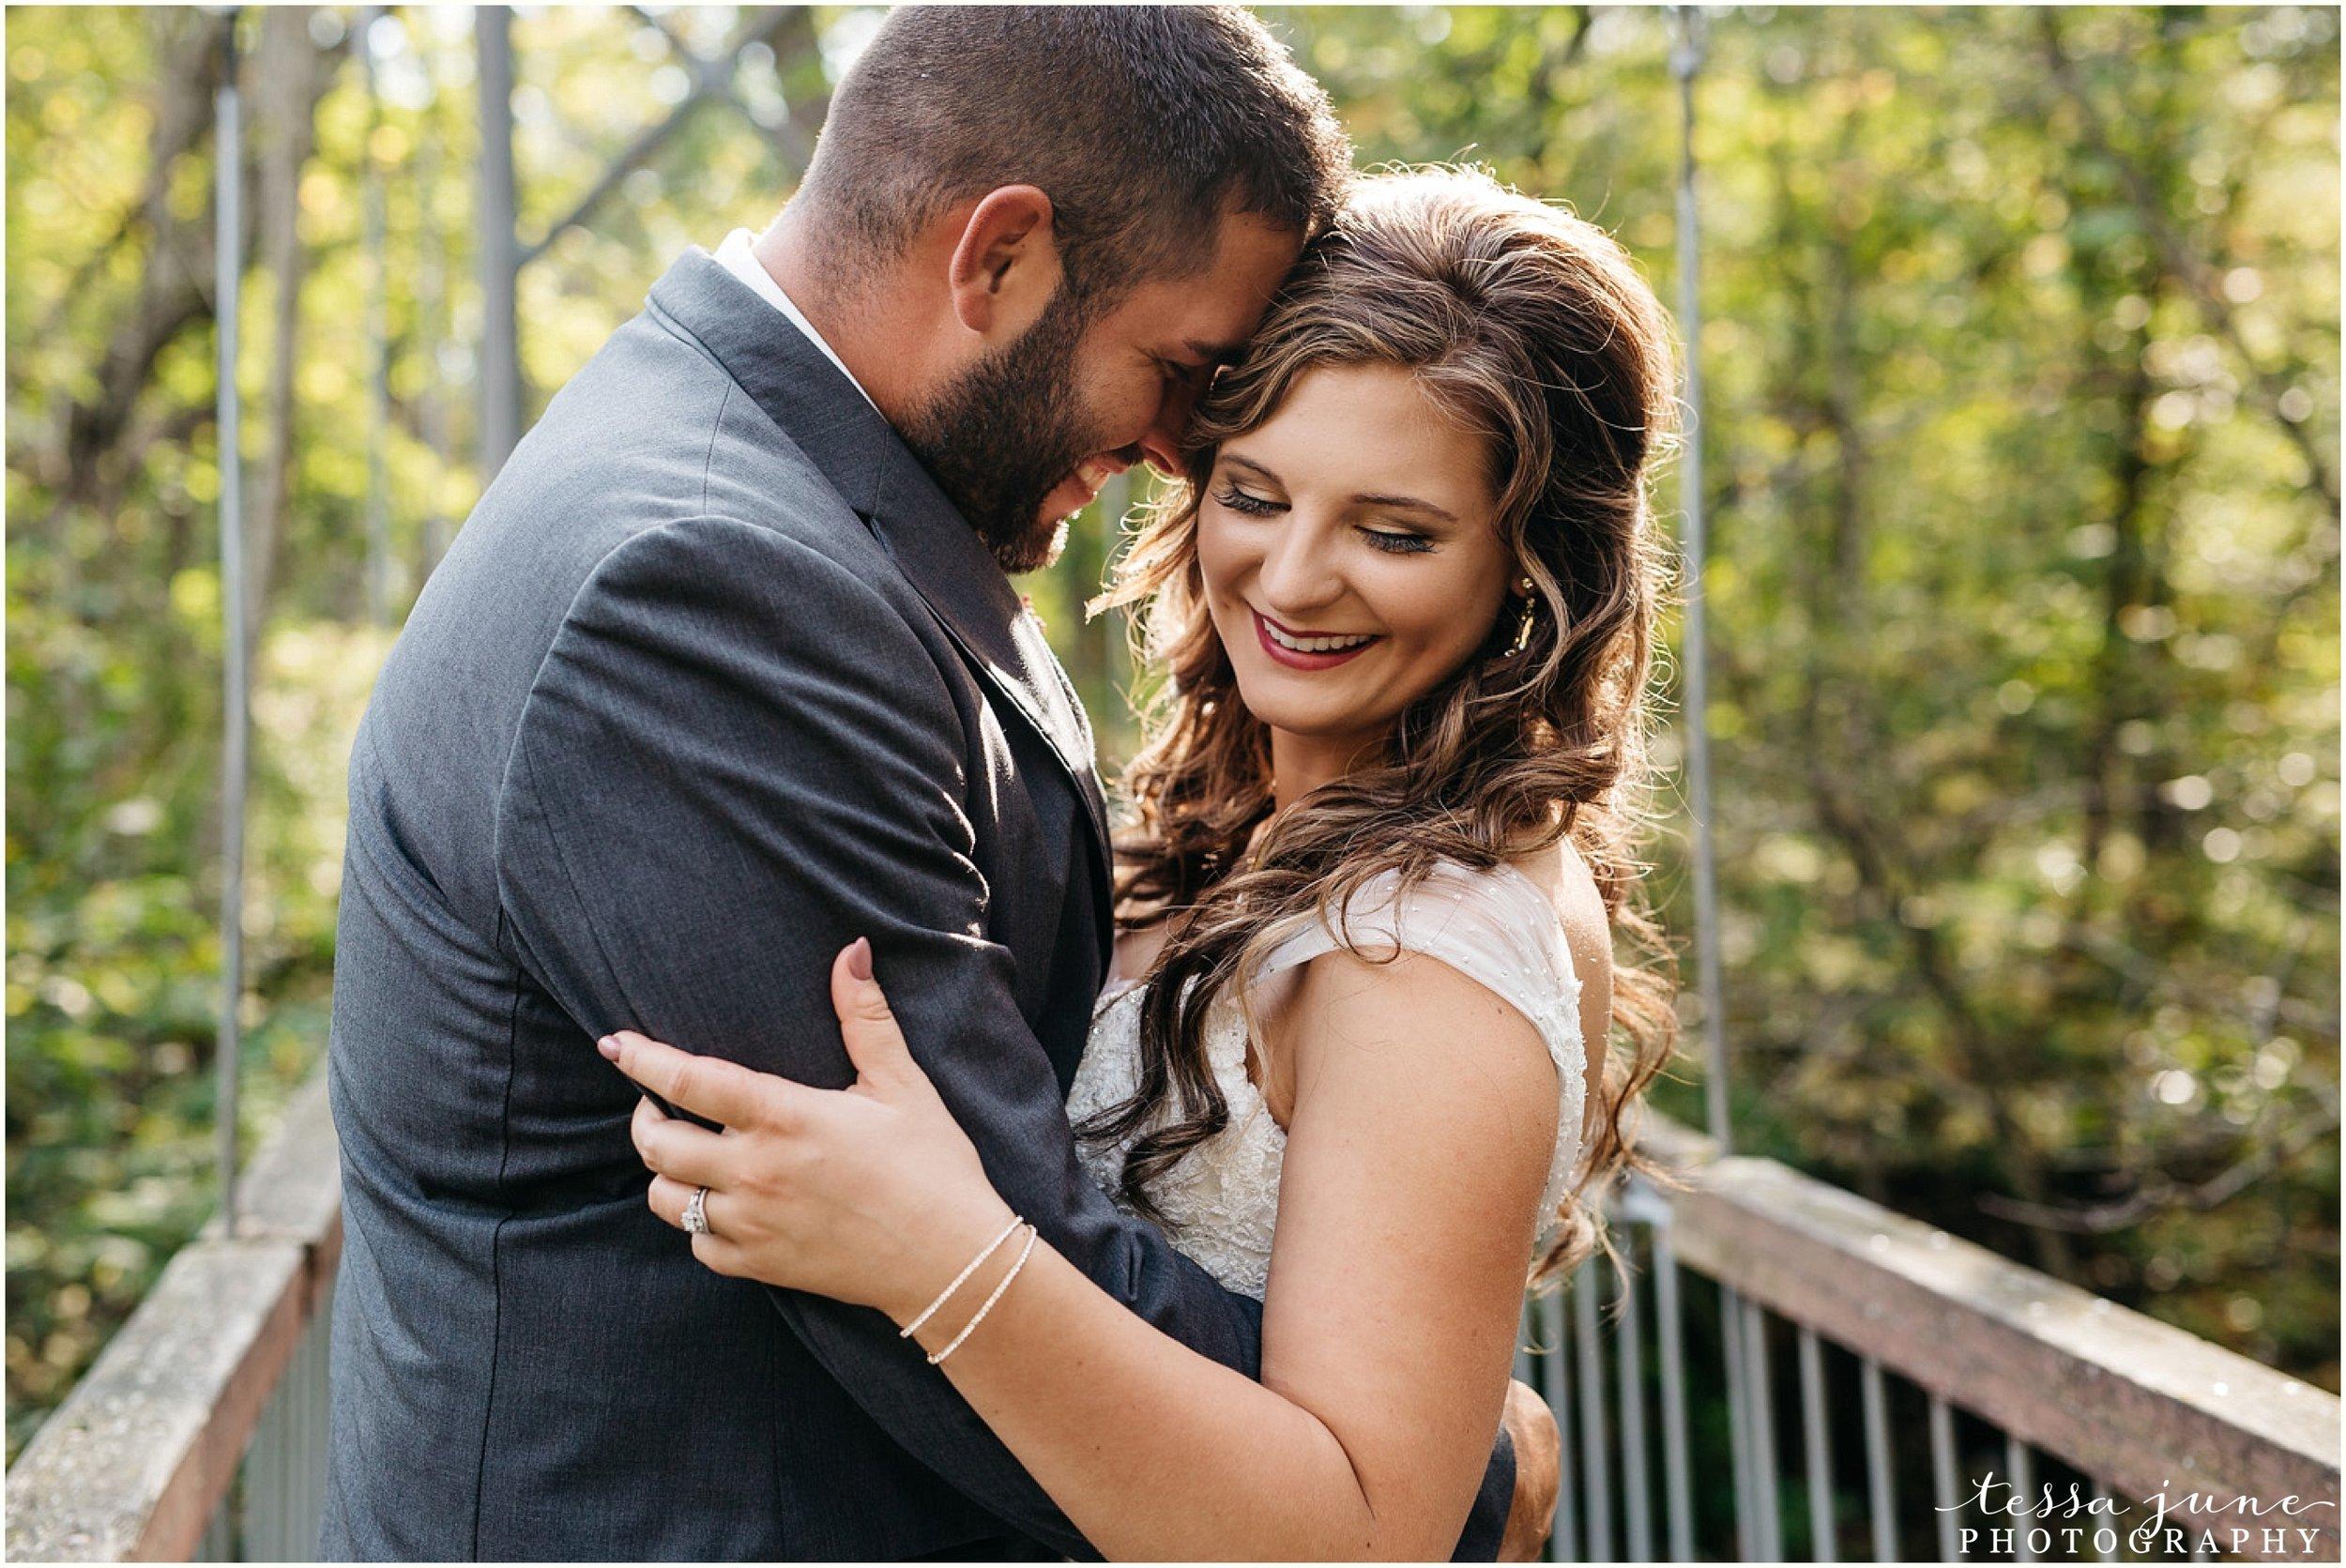 bohemian-minnesota-wedding-mismatched-bridesmaid-dresses-waterfall-st-cloud-tessa-june-photography-45.jpg